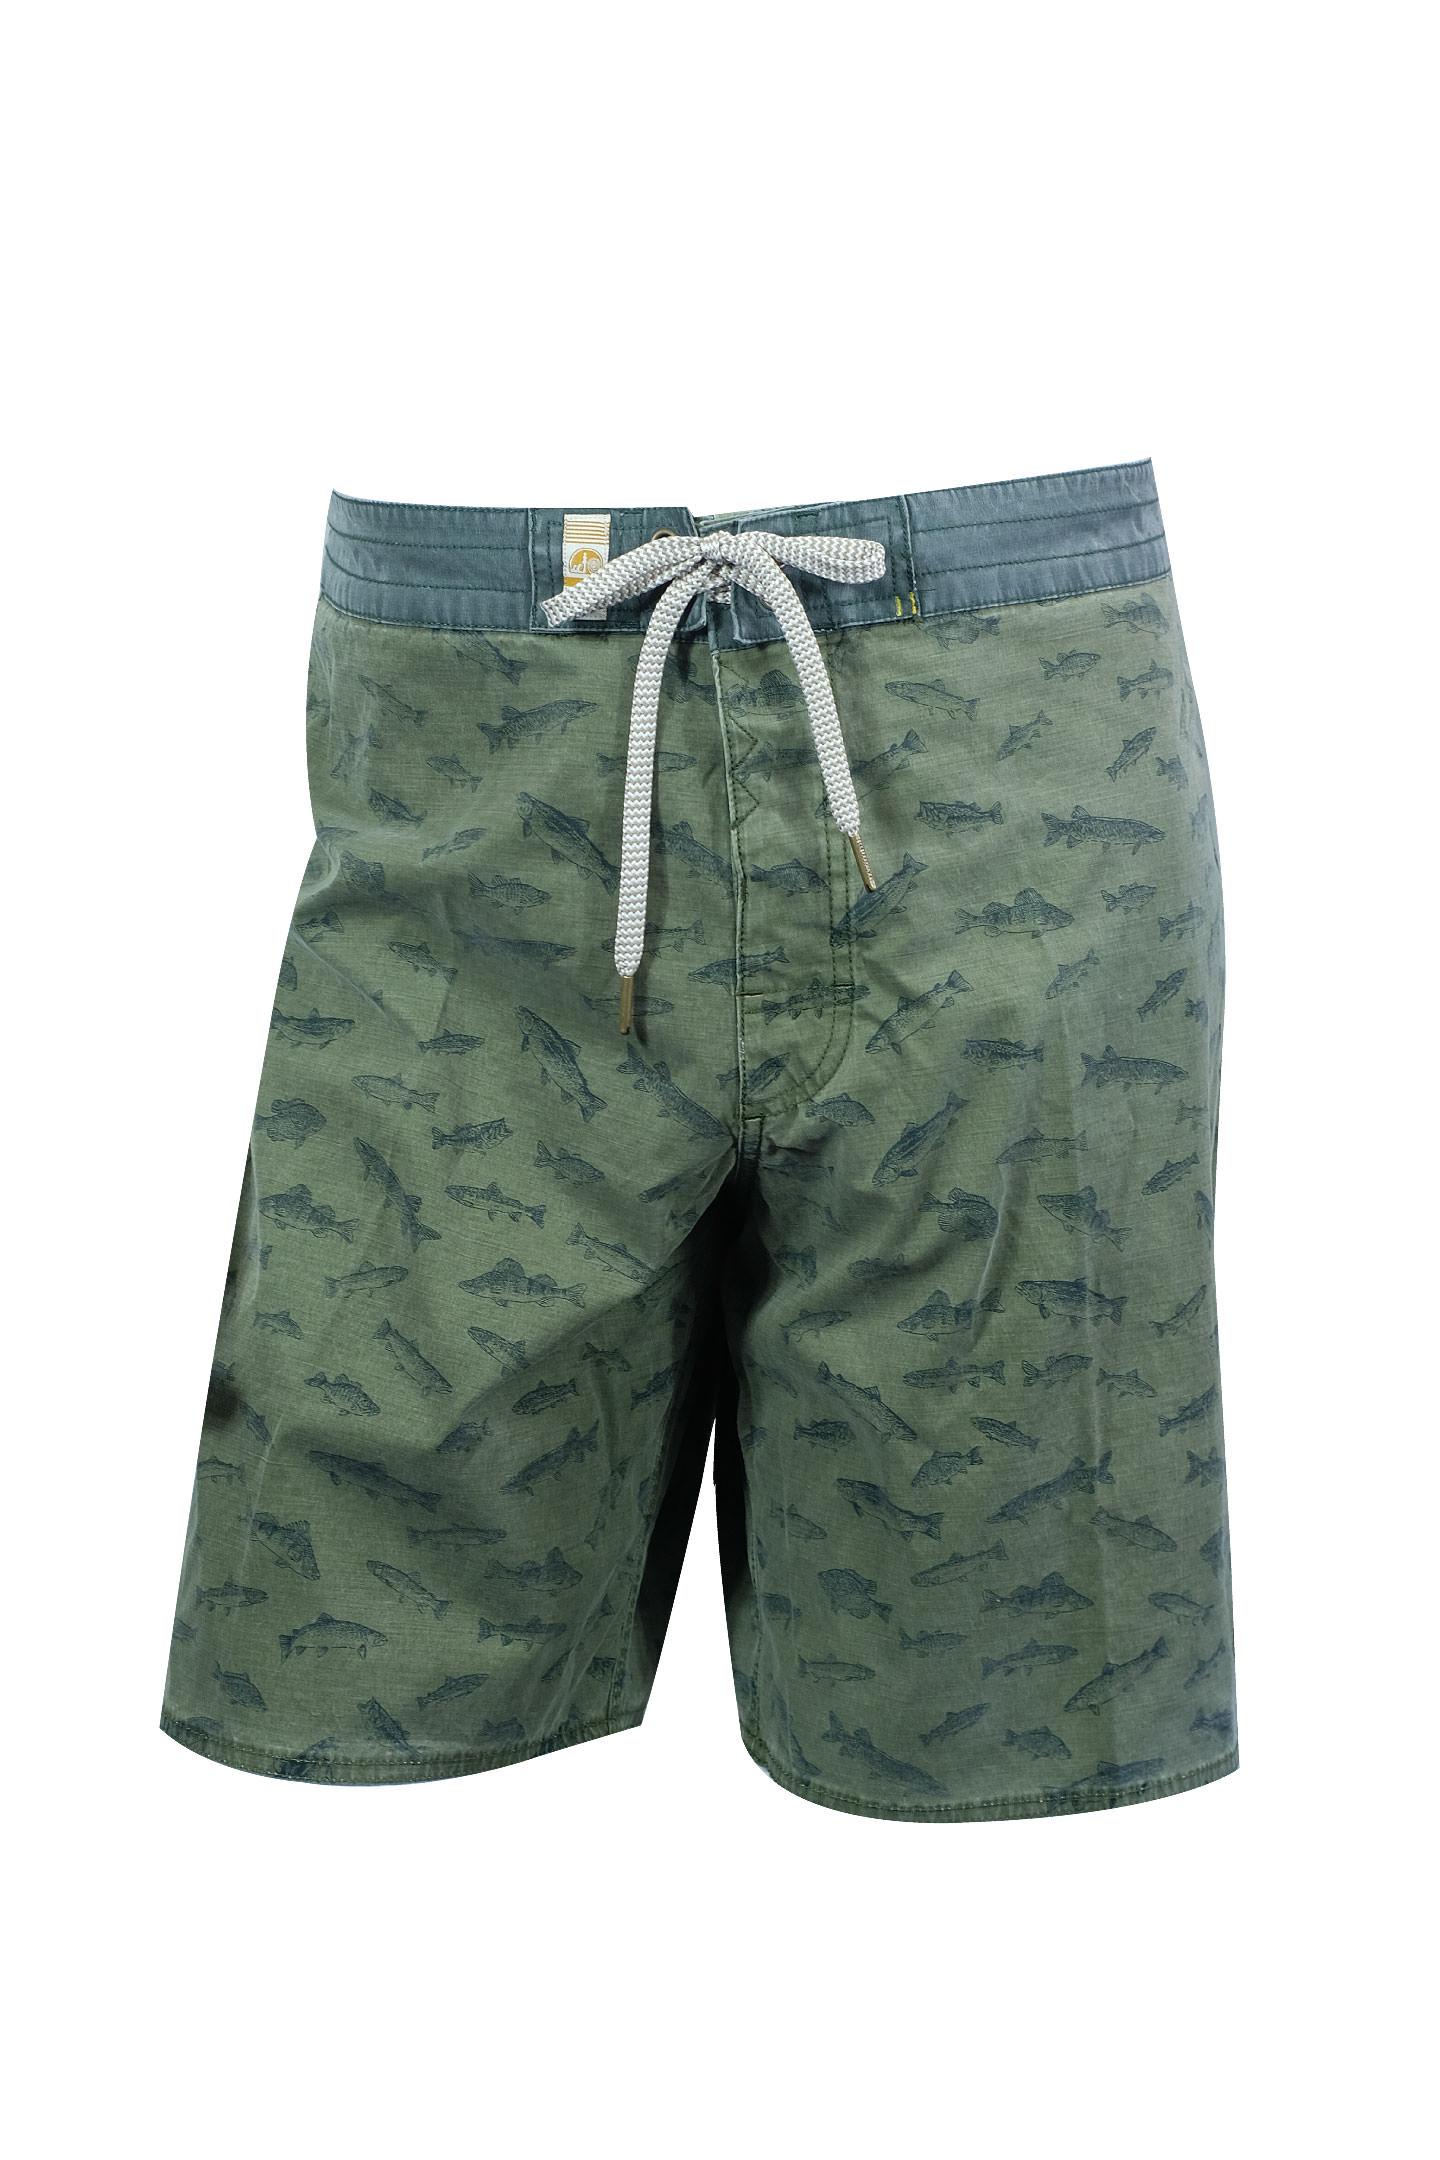 22f91ac28e Home/Shorts/New School Boardshort. Previous; Next